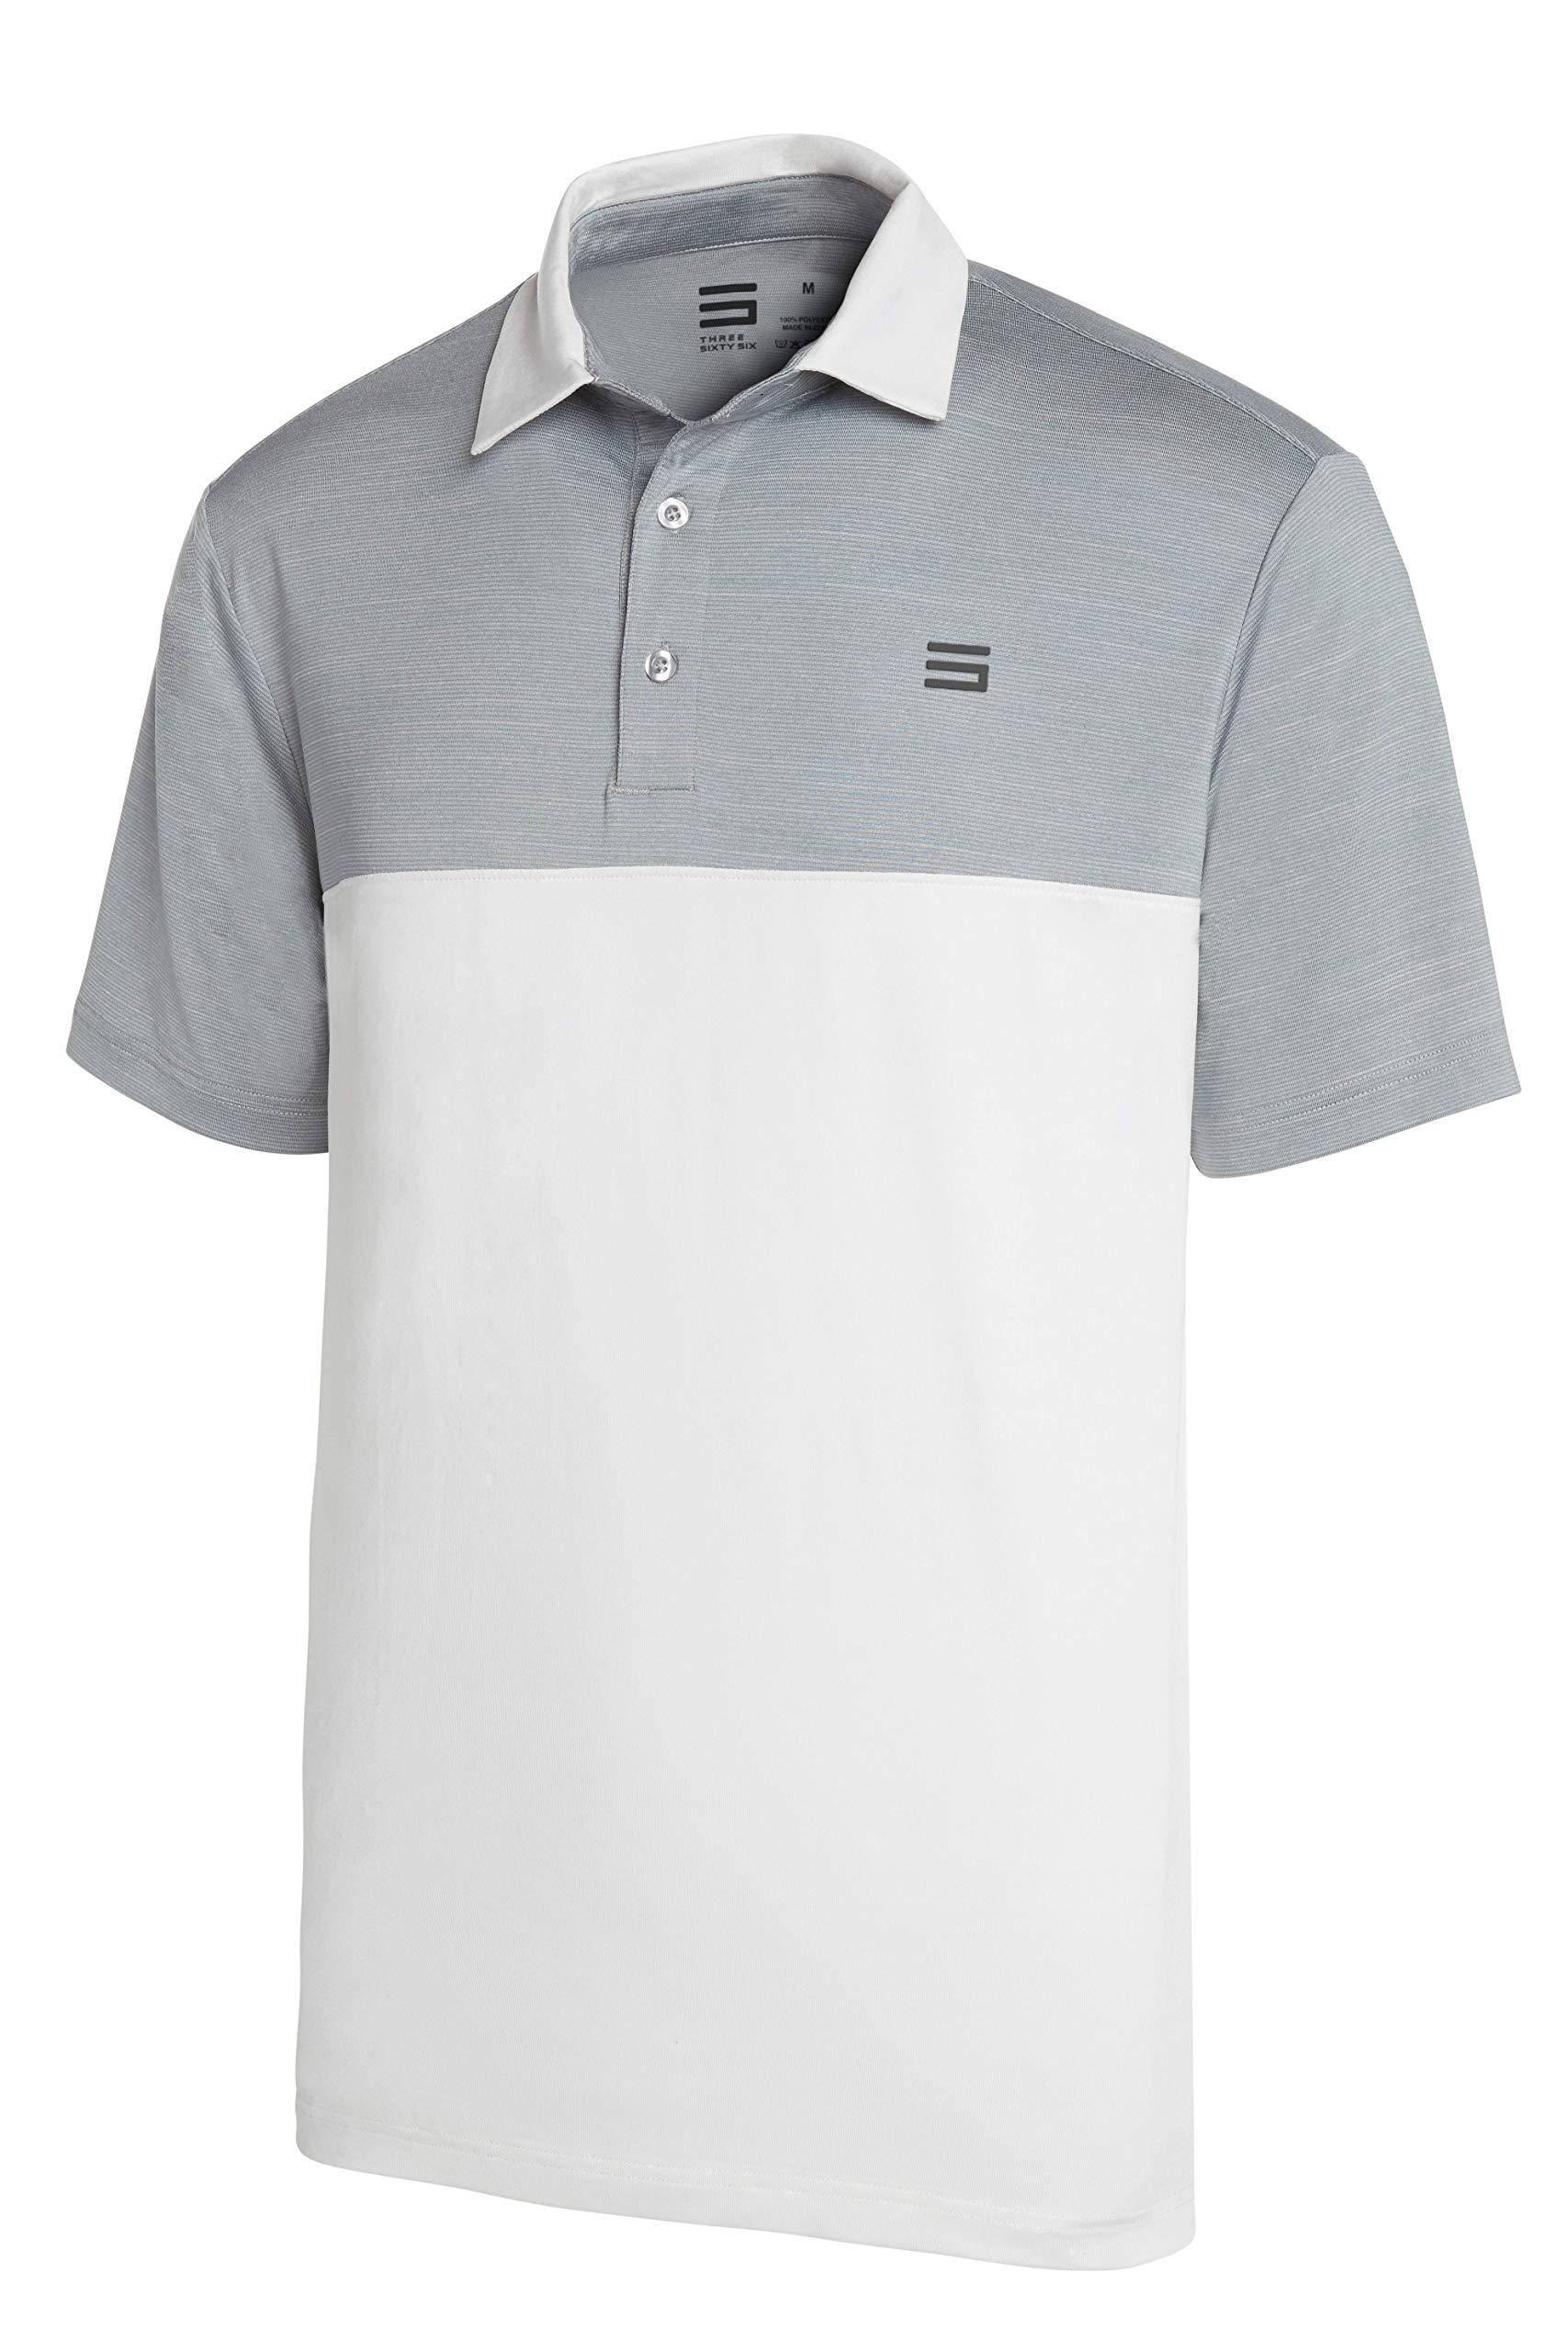 Three Sixty Six Dri-Fit Golf Shirts for Men - Moisture Wicking Short-Sleeve Polo Shirt by Three Sixty Six